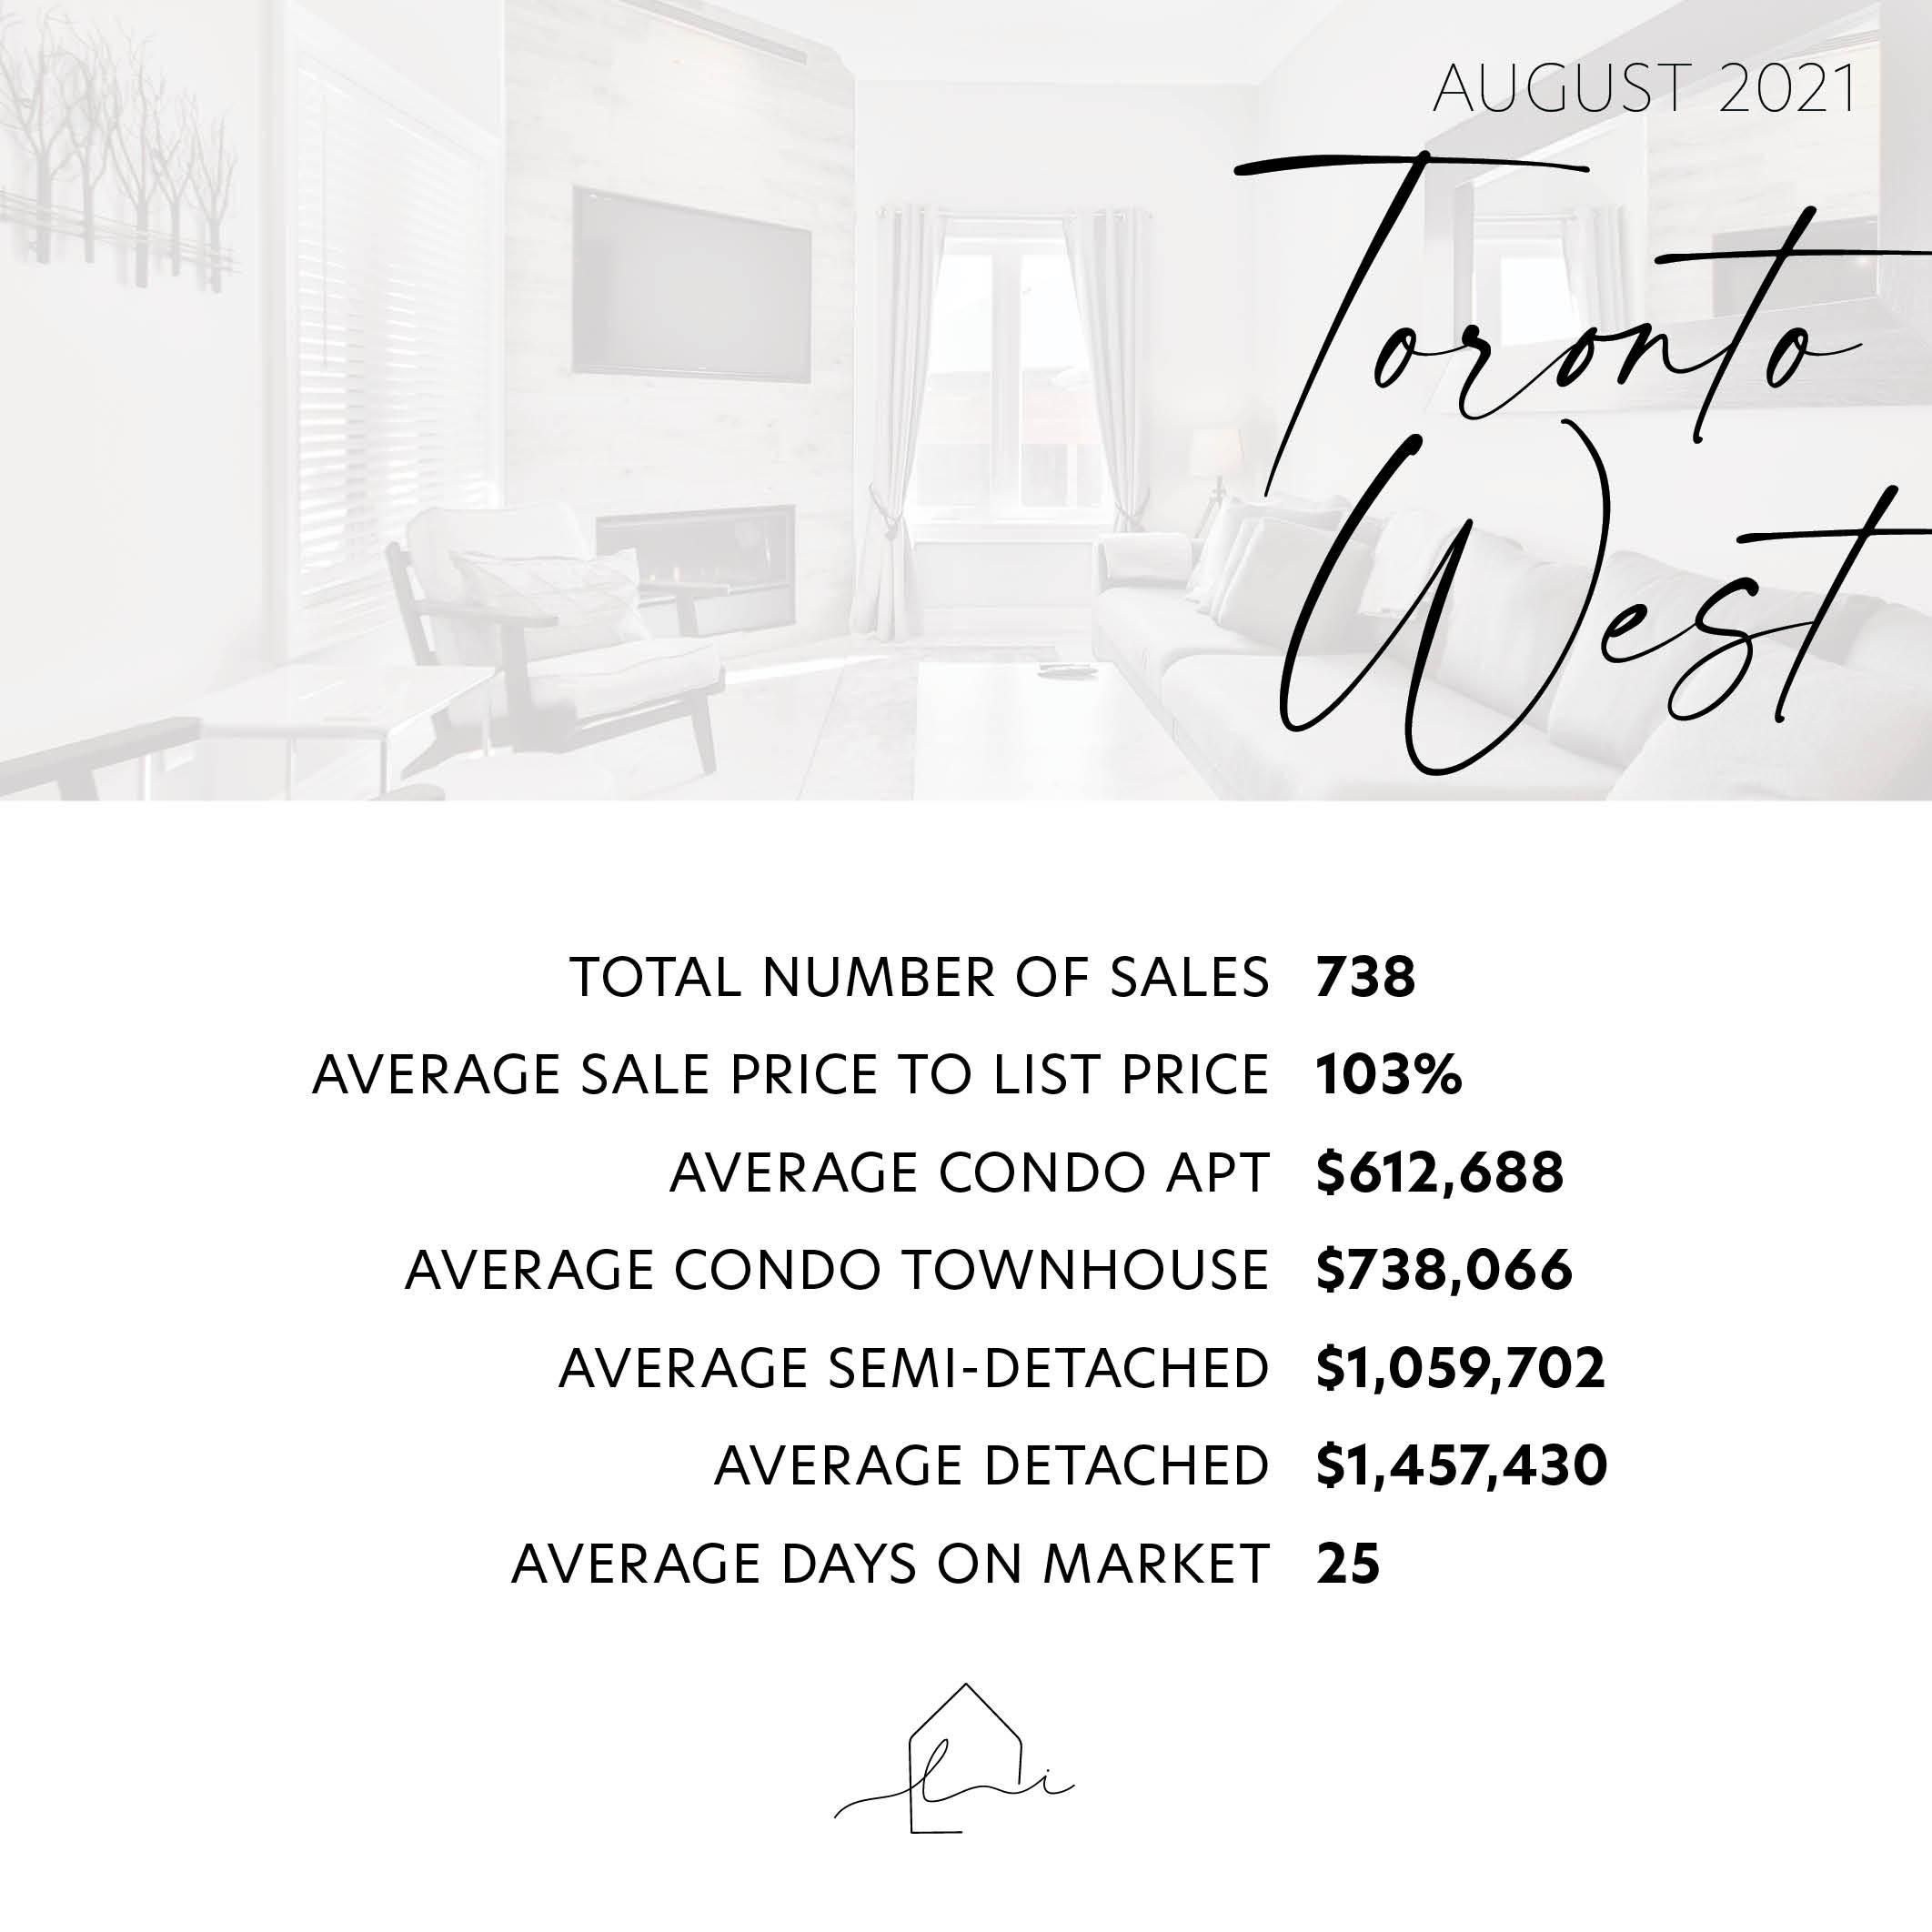 Toronto West Lara Stasiw Real Estate